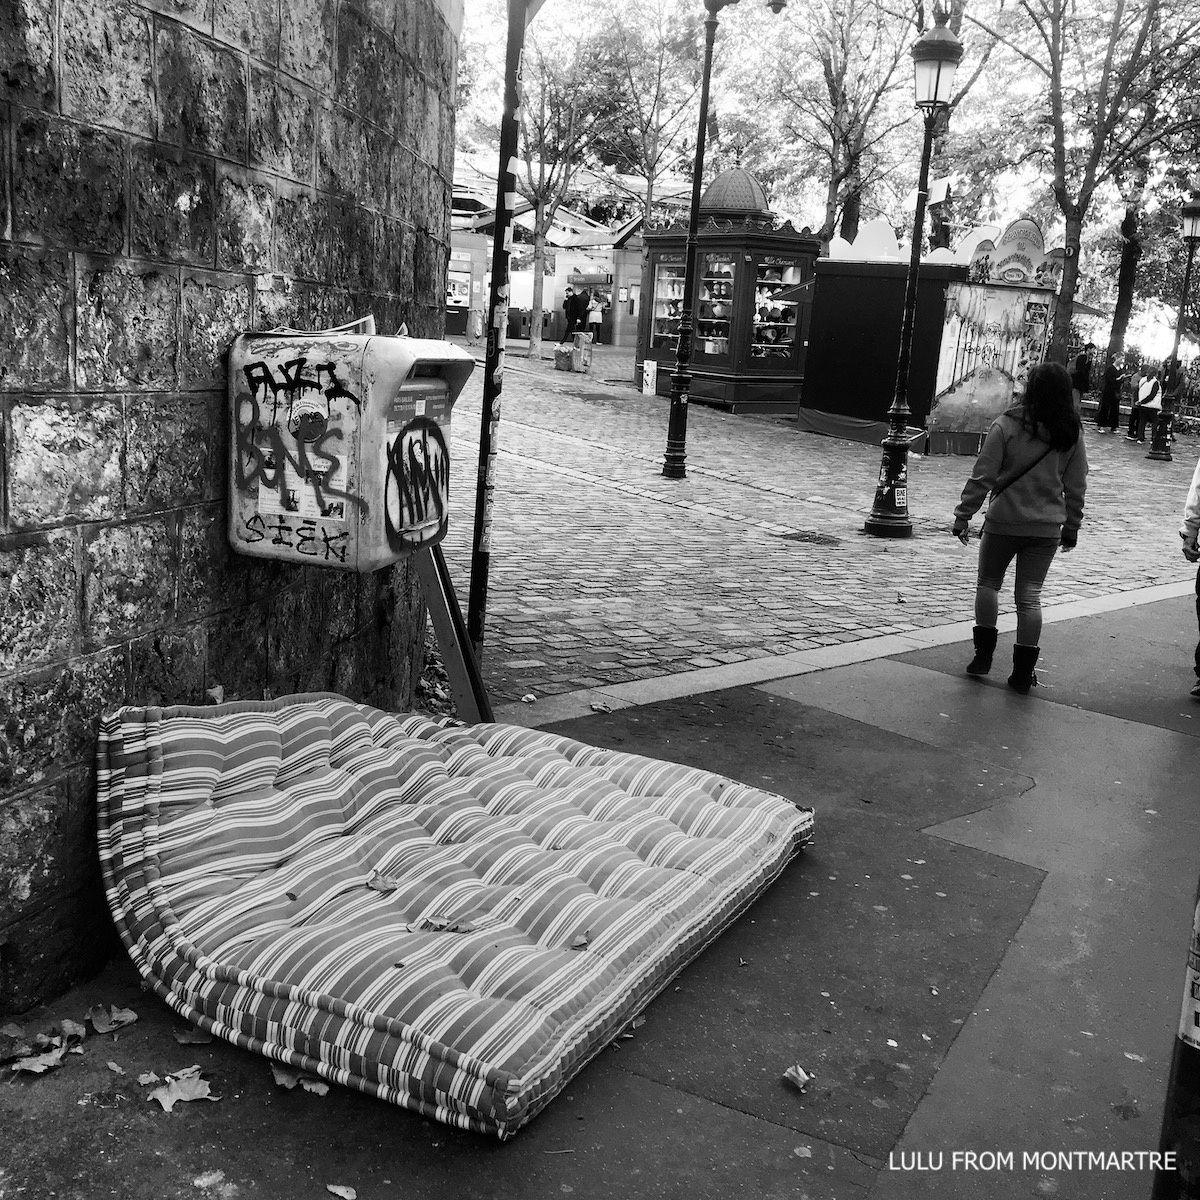 04. Lost in Montmartre, 75018